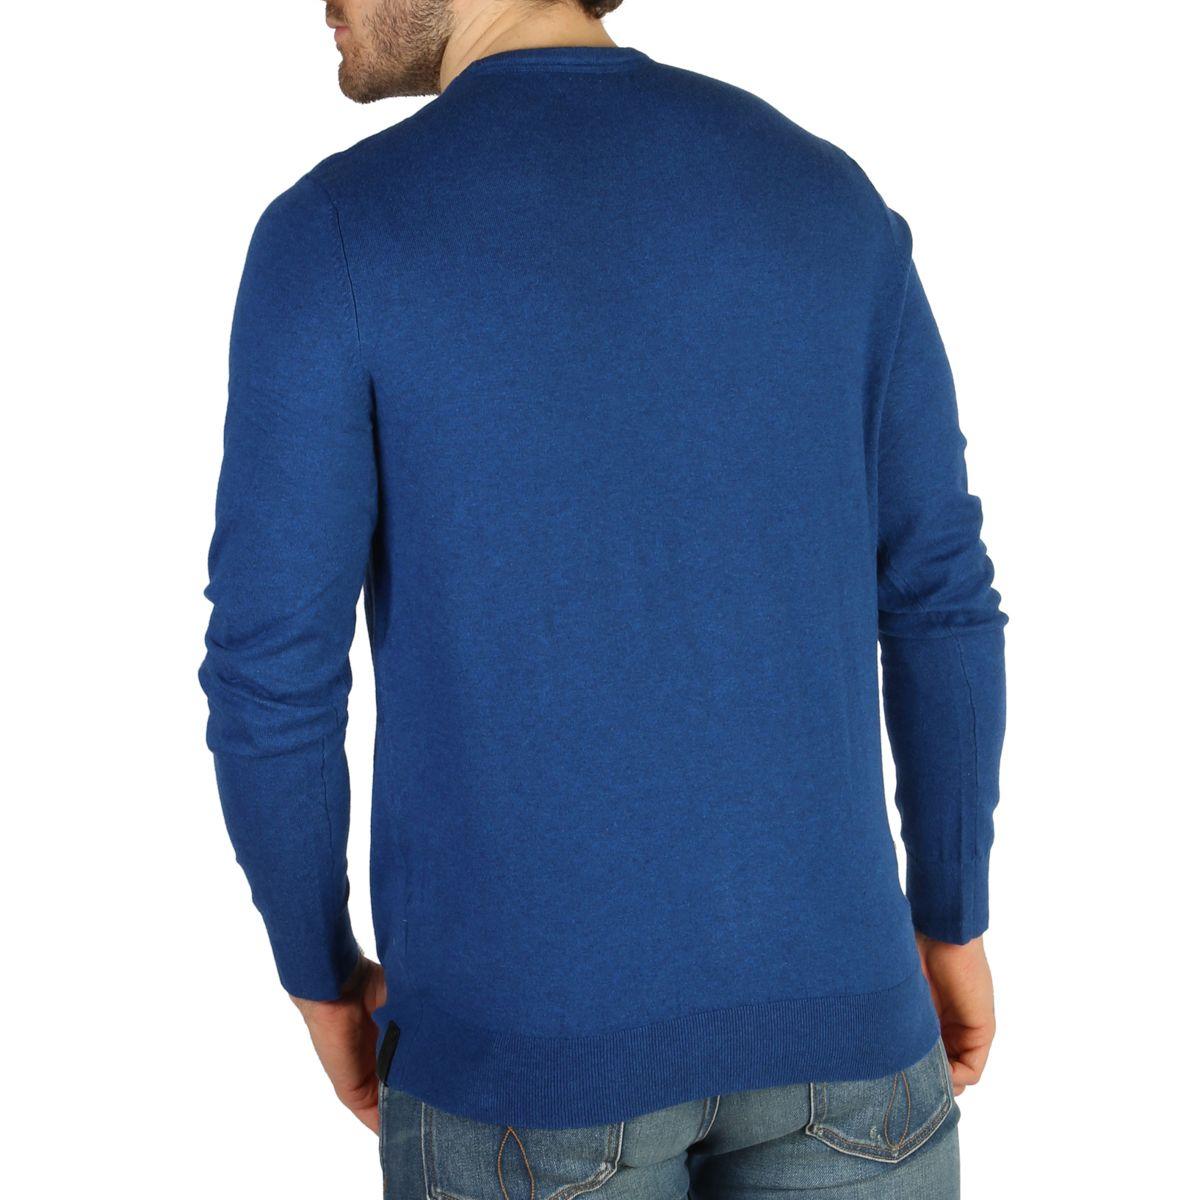 Calvin Klein – J30J304649 – Azul